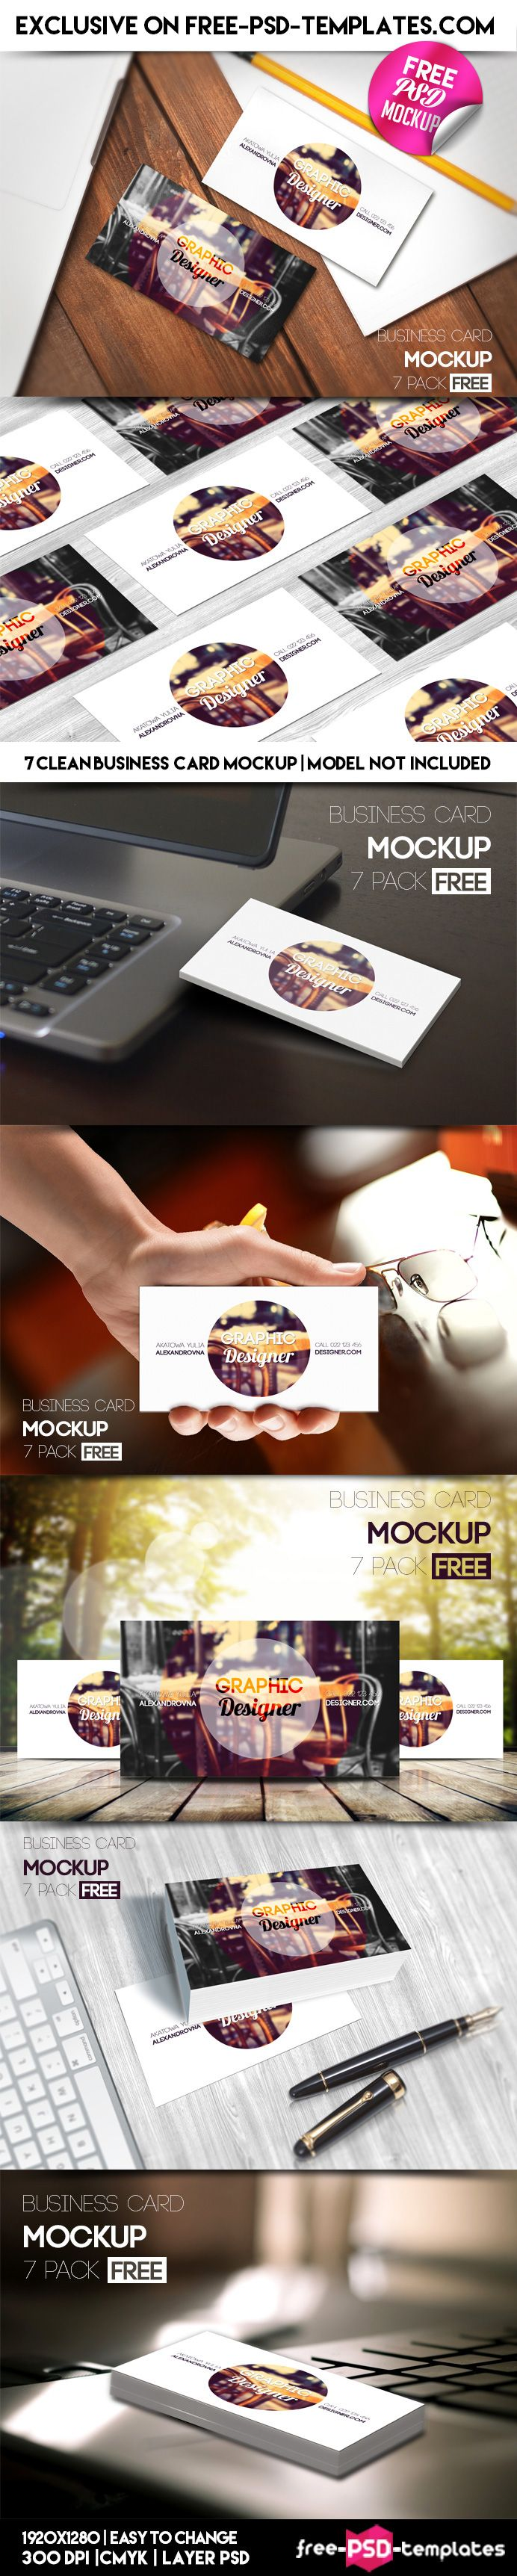 7 Free PSD Business Card Mockups on Behance